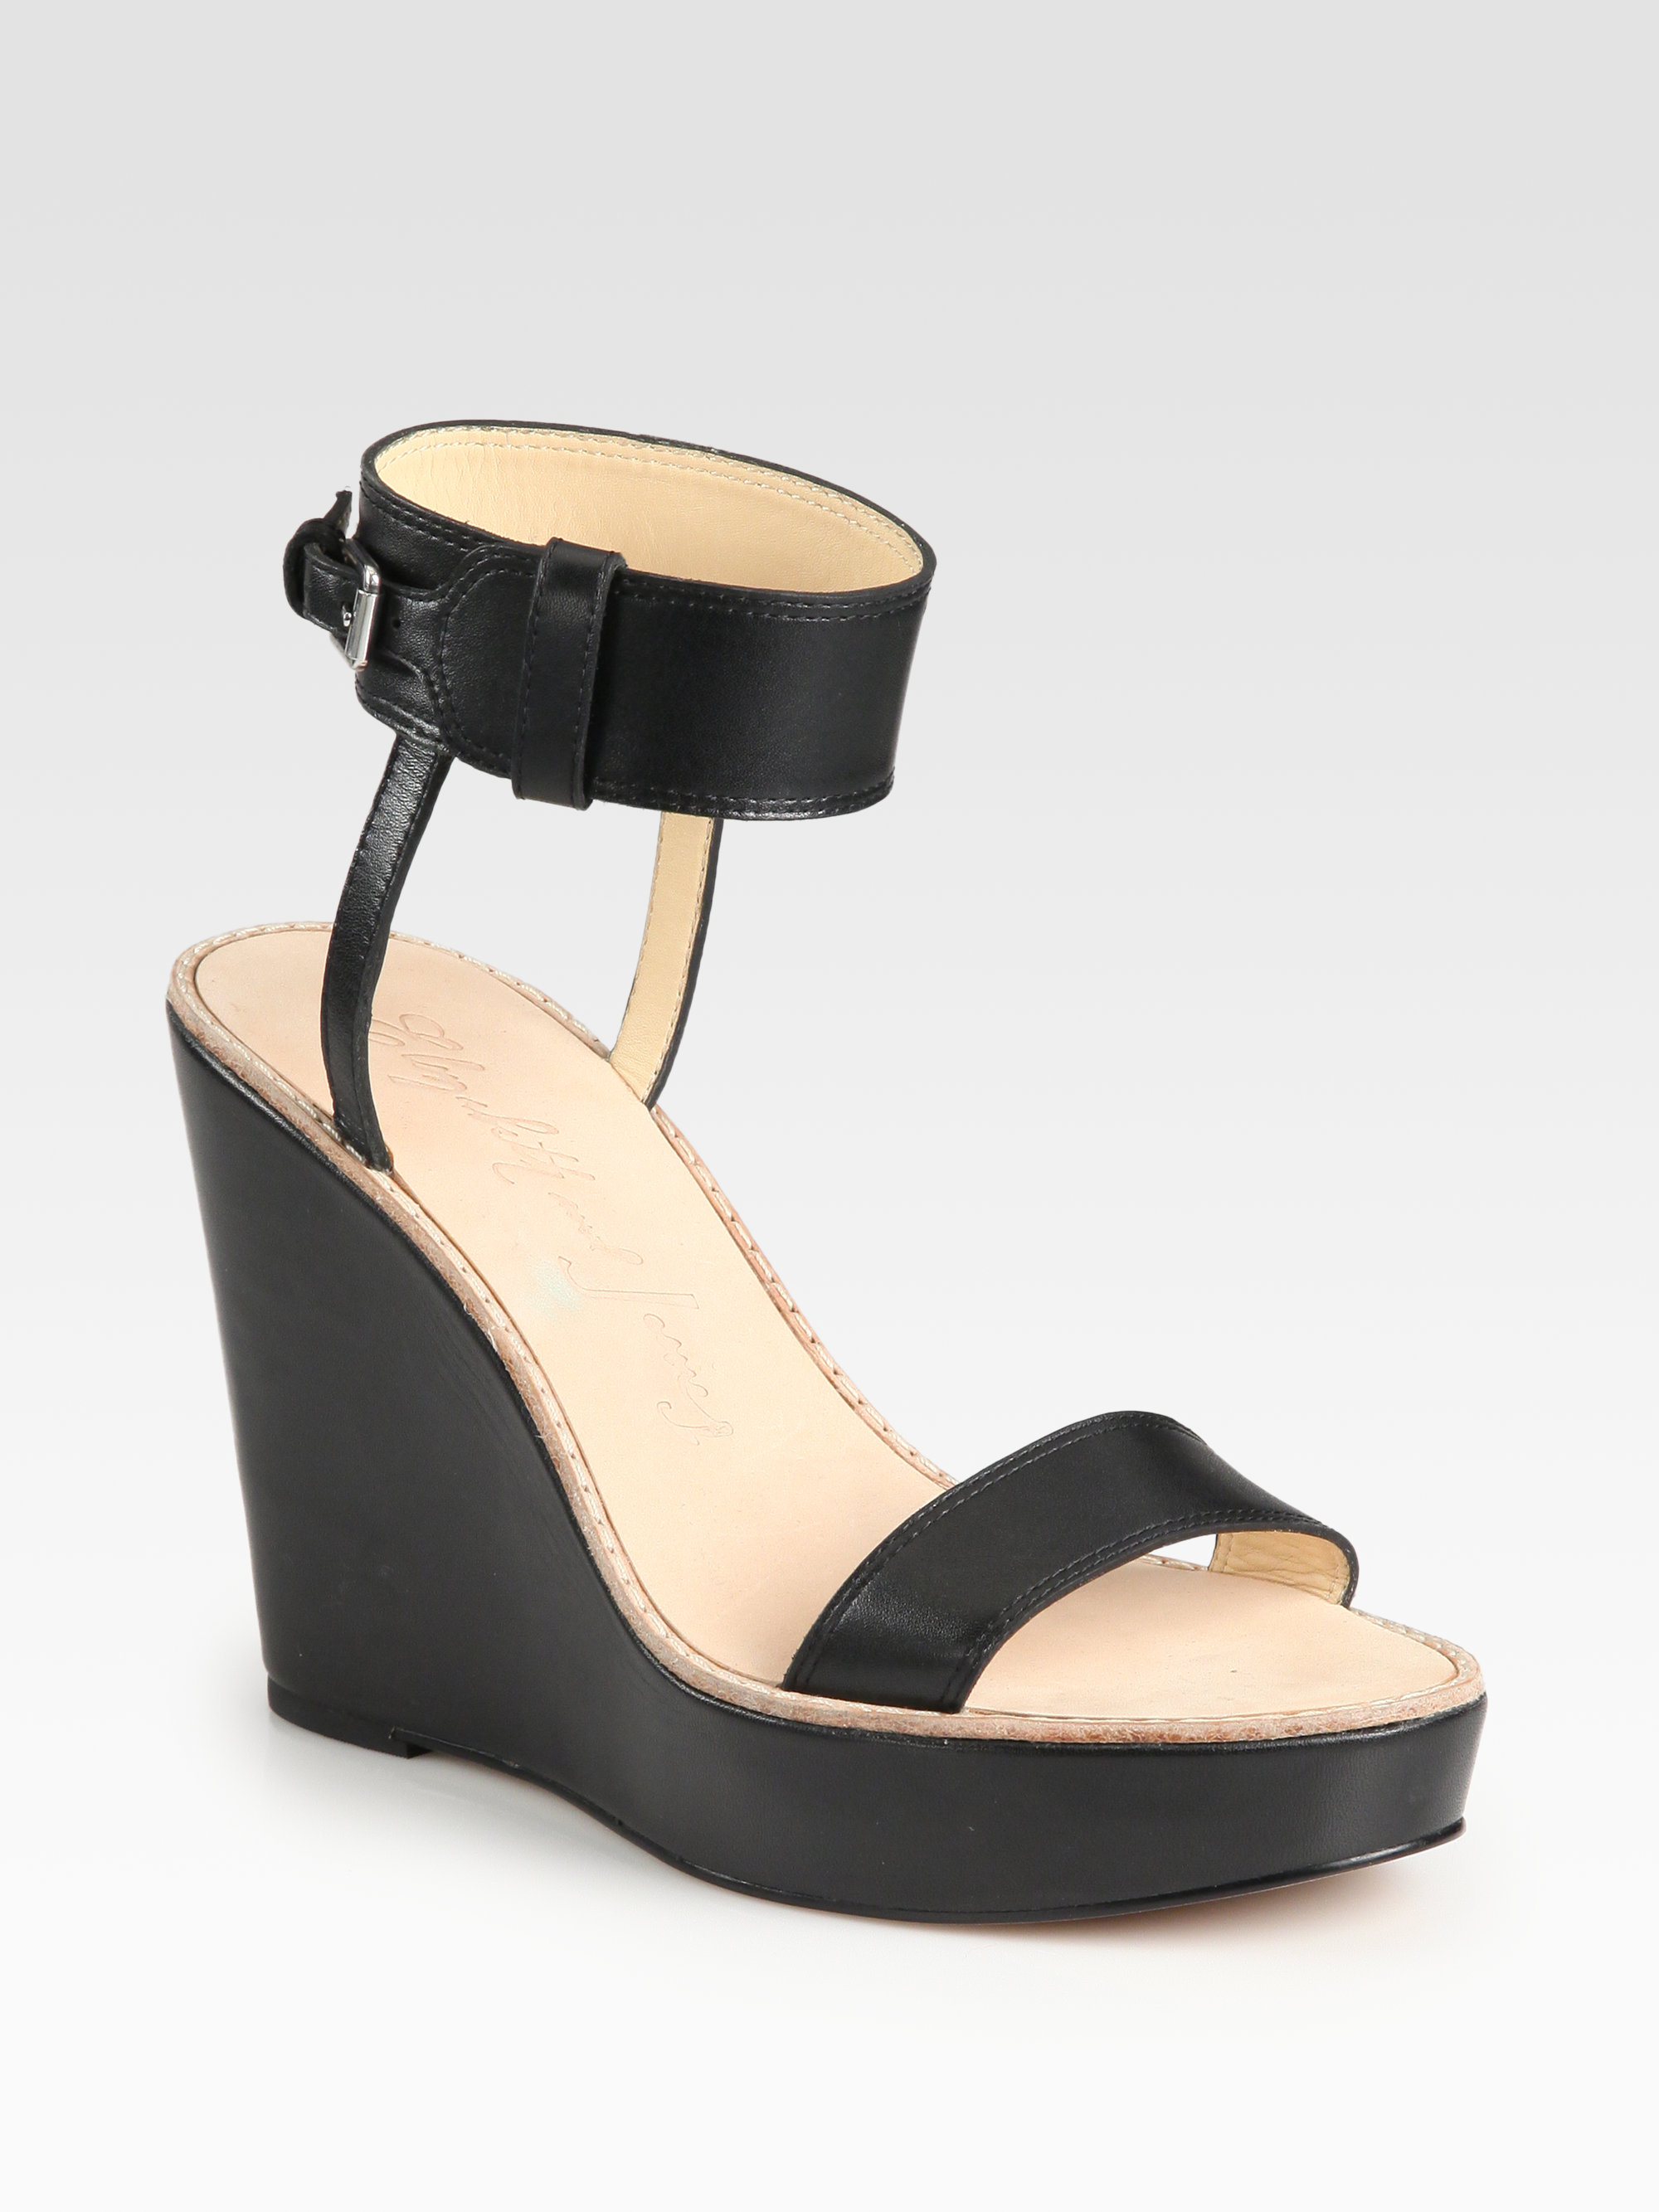 Elizabeth and James Leather Multistrap Sandals cheap sale for cheap roisg4cAH